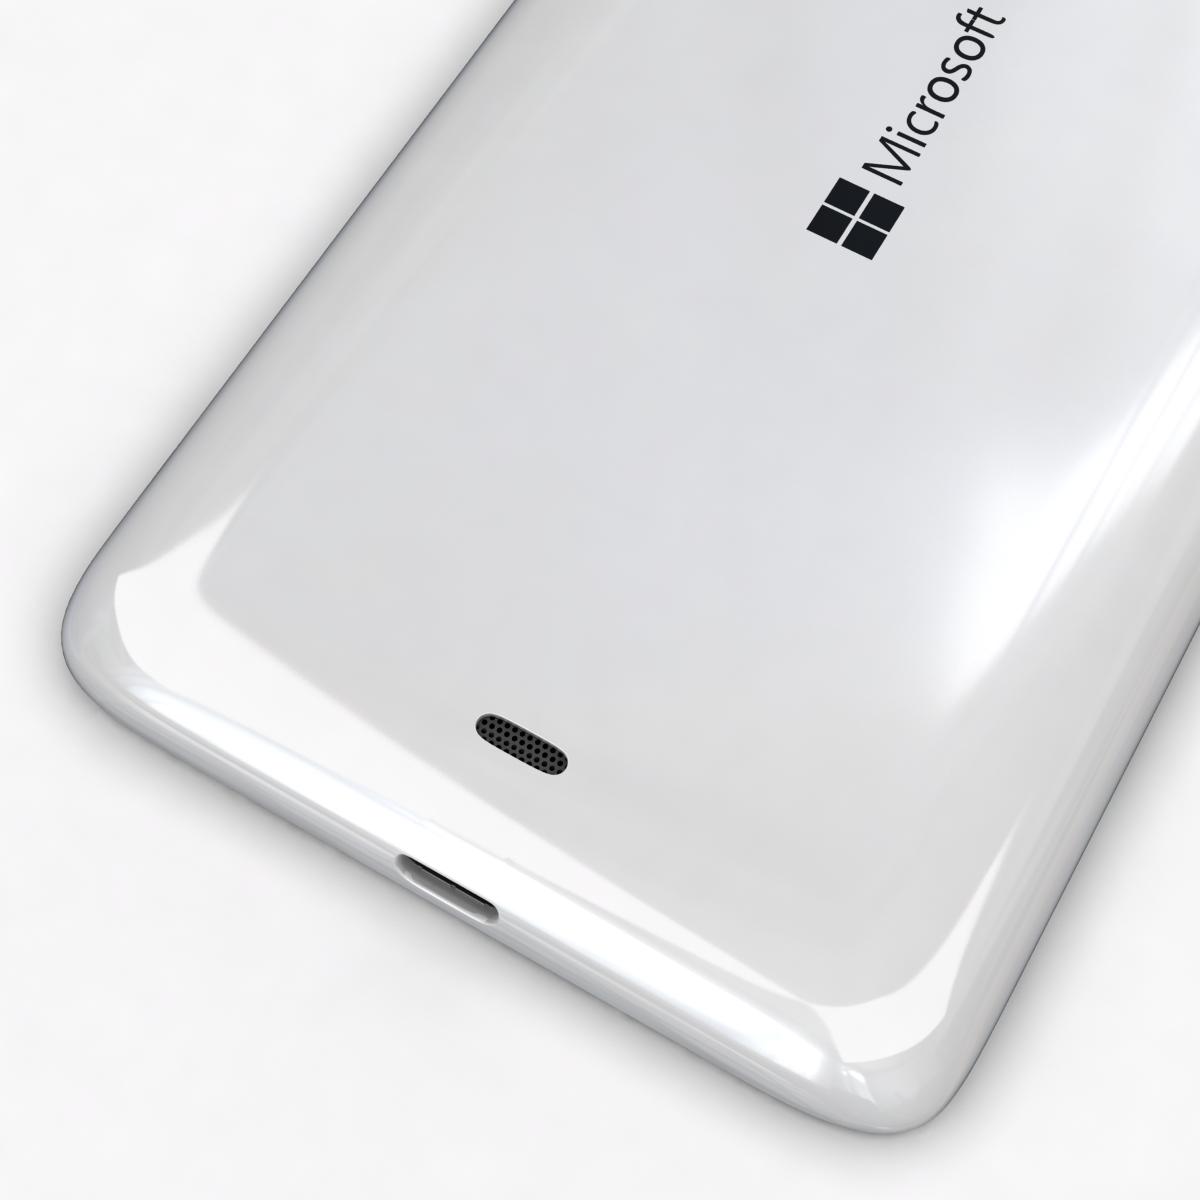 microsoft lumia 535 and dual sim white 3d model 3ds max fbx c4d obj 204288